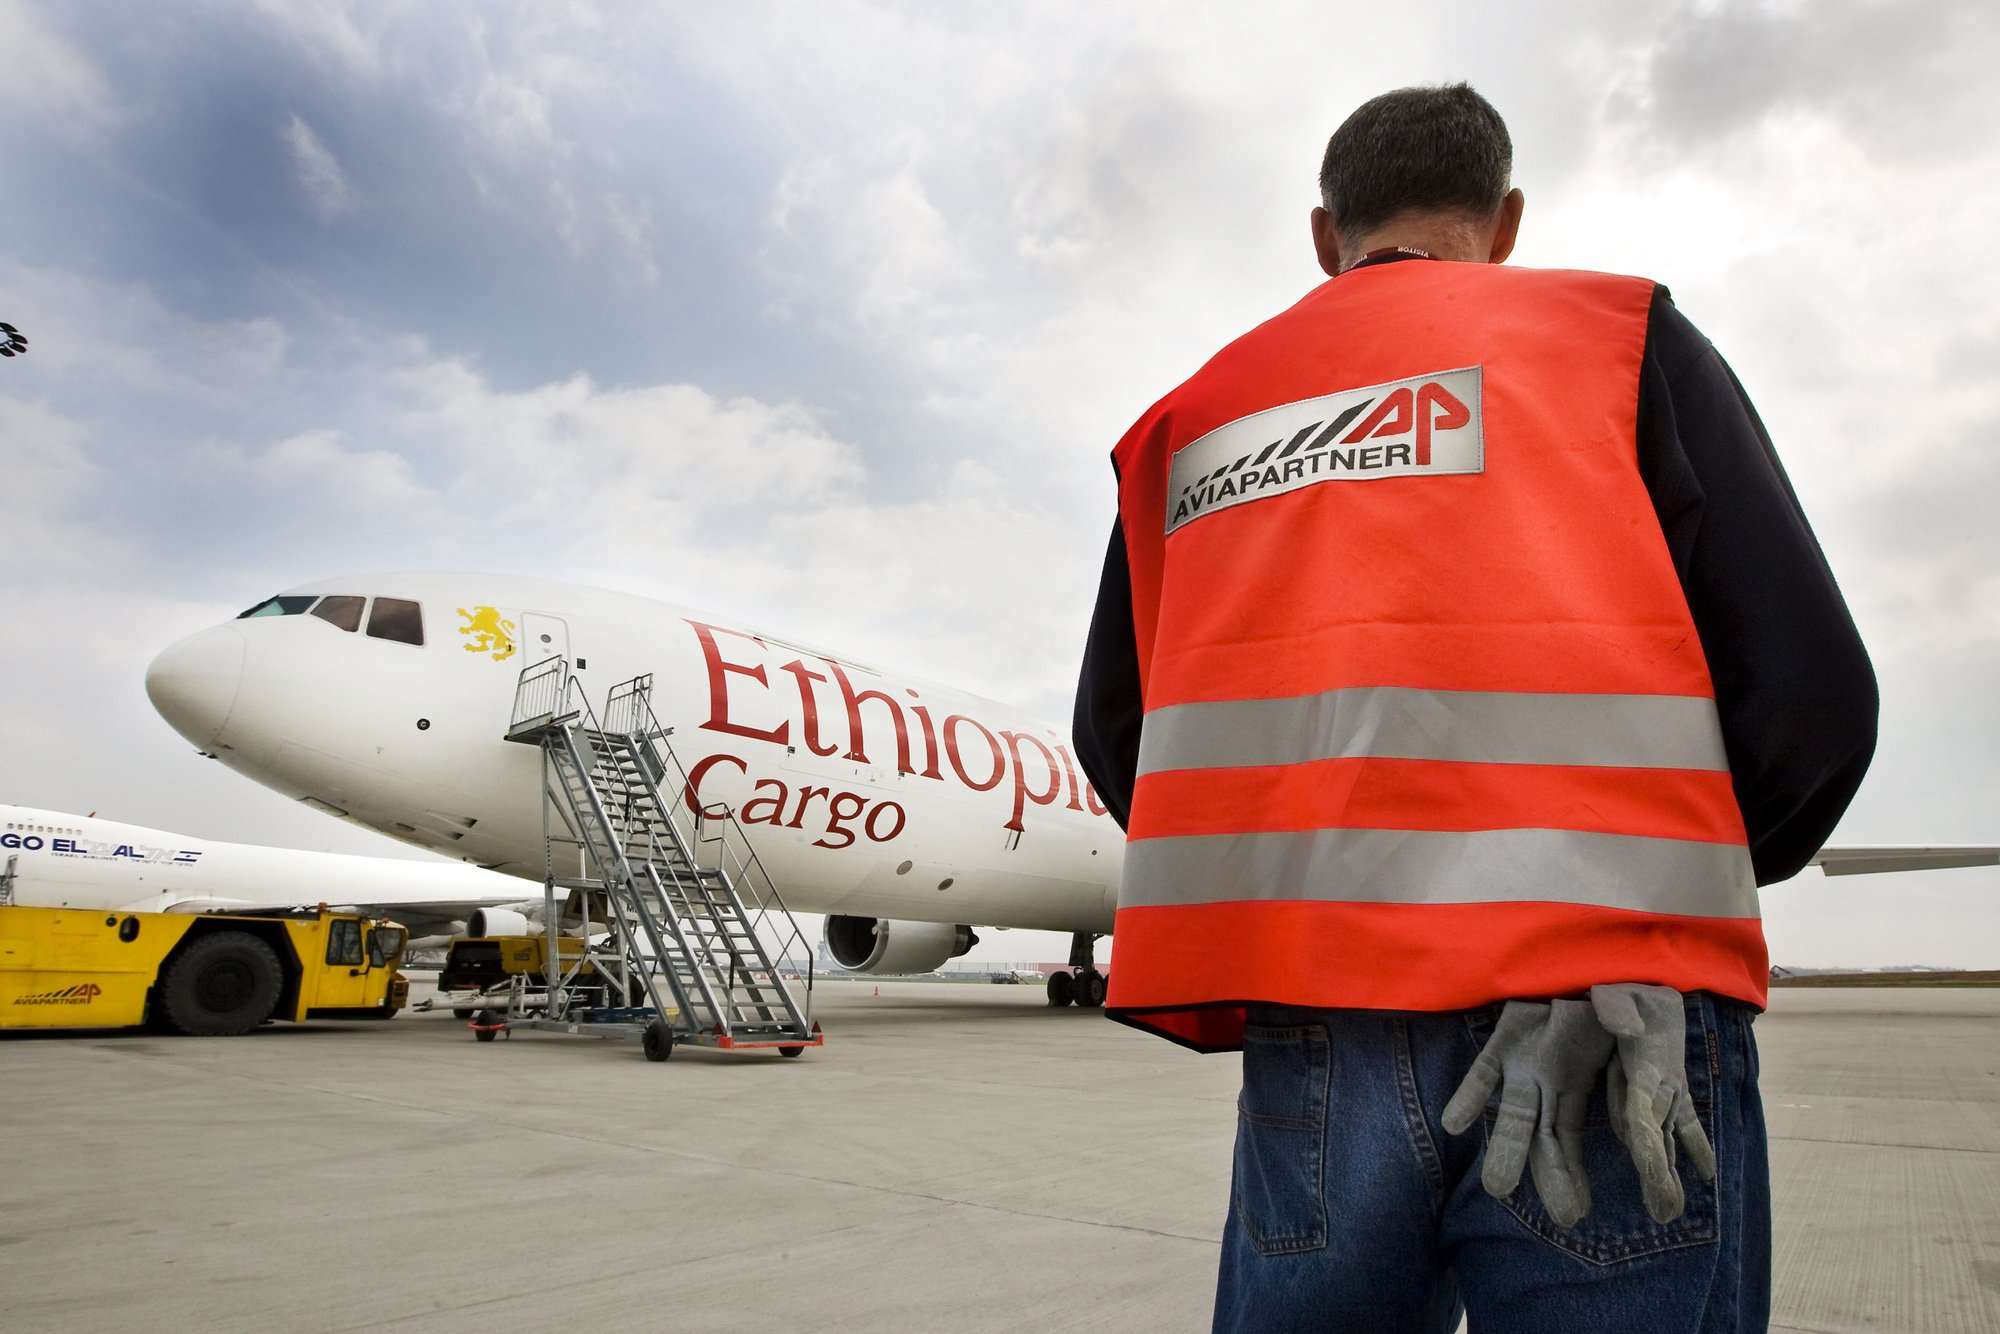 Tarmac, personnel de piste avec chasuble operations Aviapartner sur avion cargo Ethiopian Airlines. Aviapartner Liege Airport Cargo